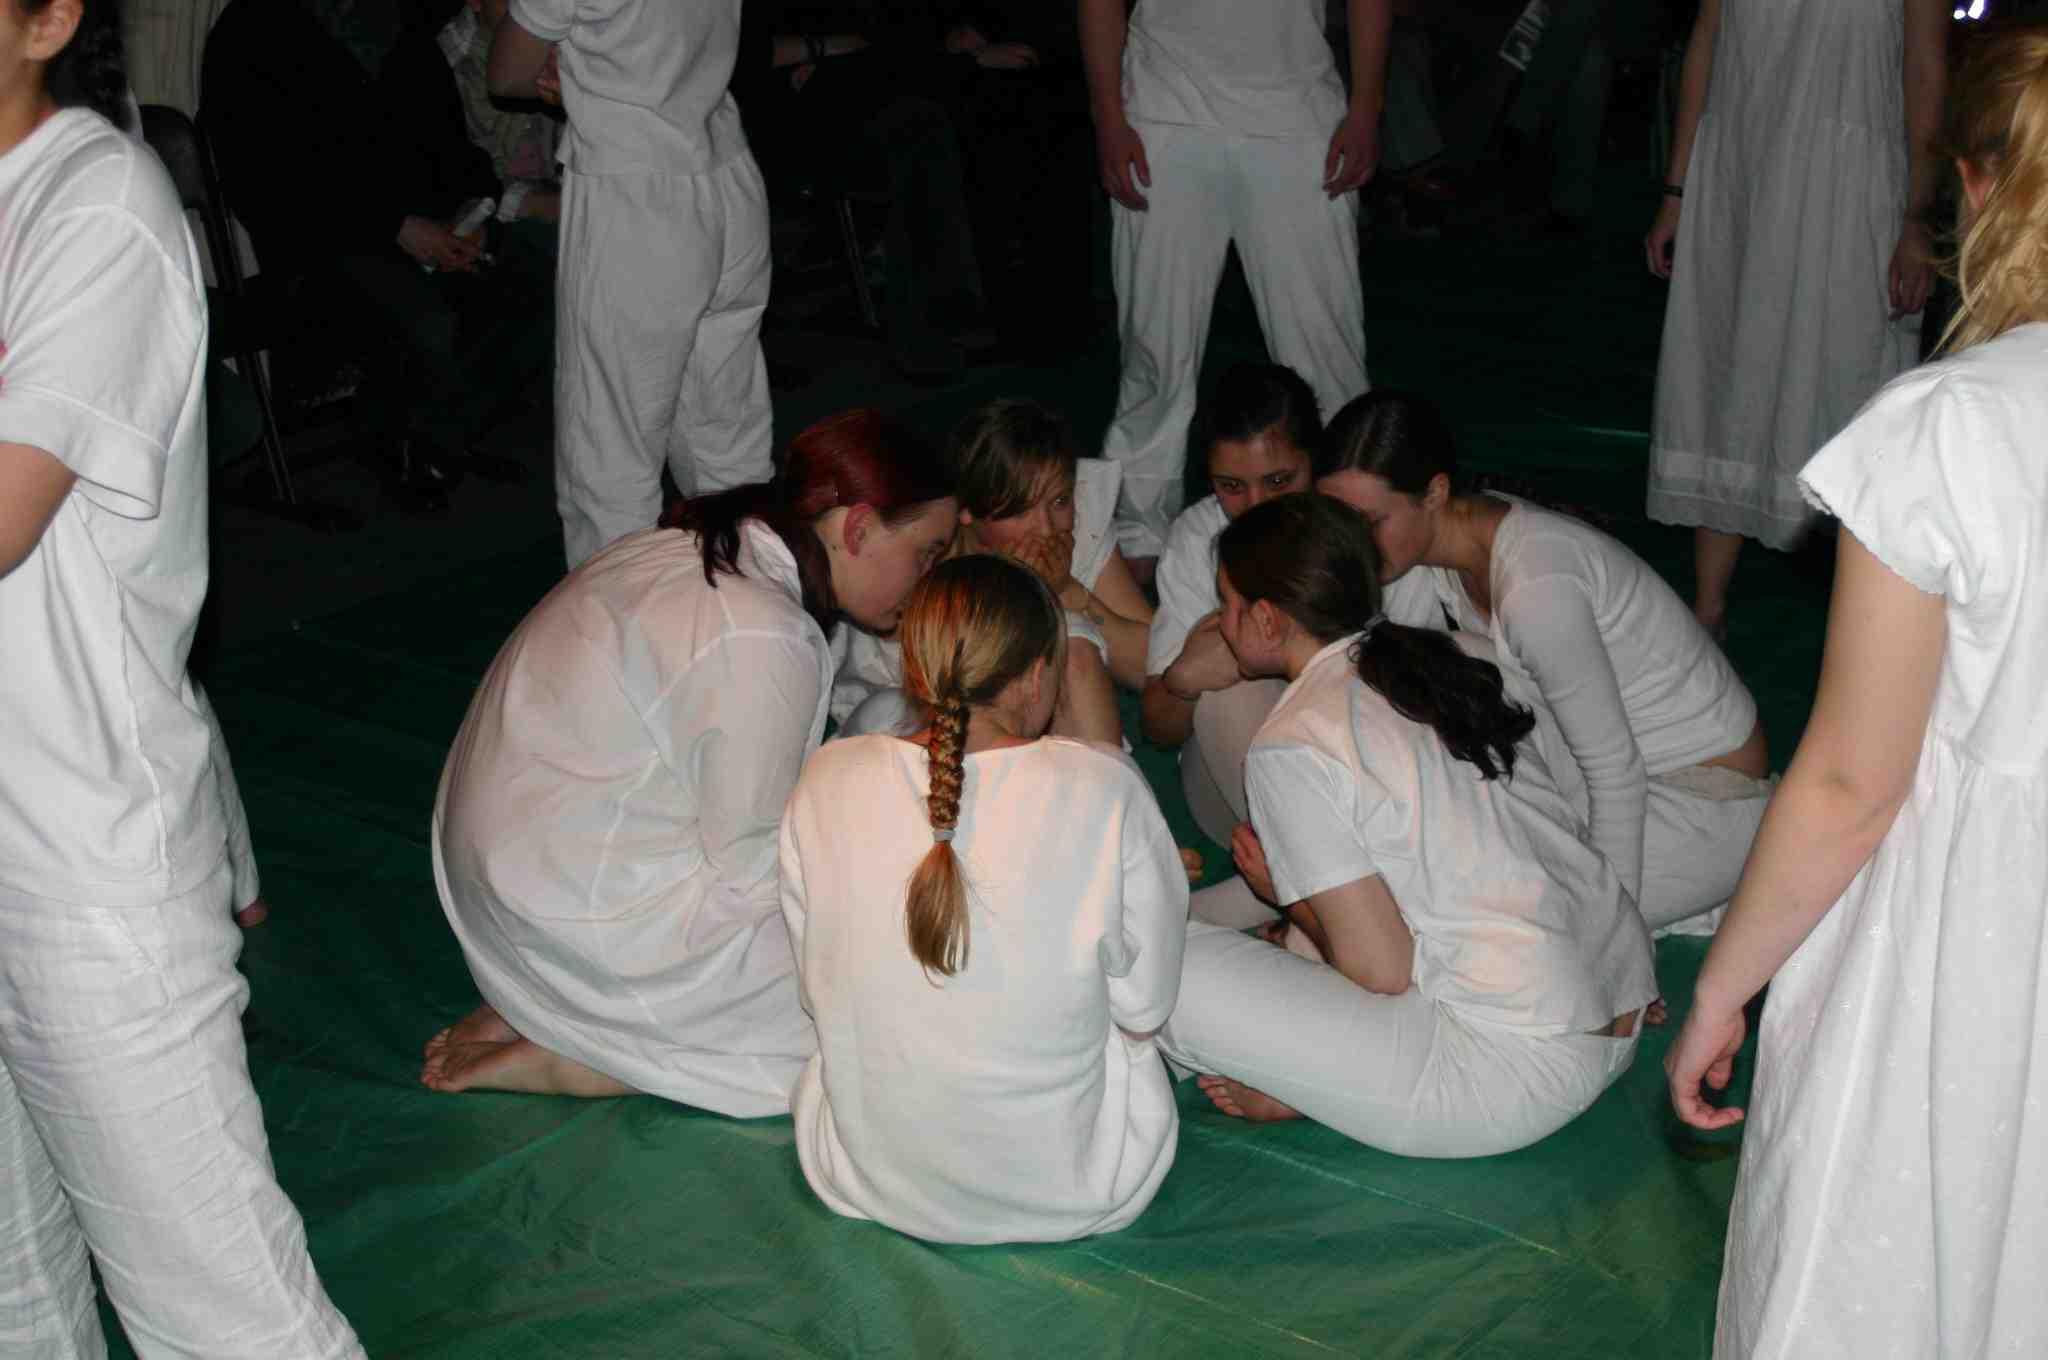 Angewandte Theaterforschung untersucht Gruppenprozesse